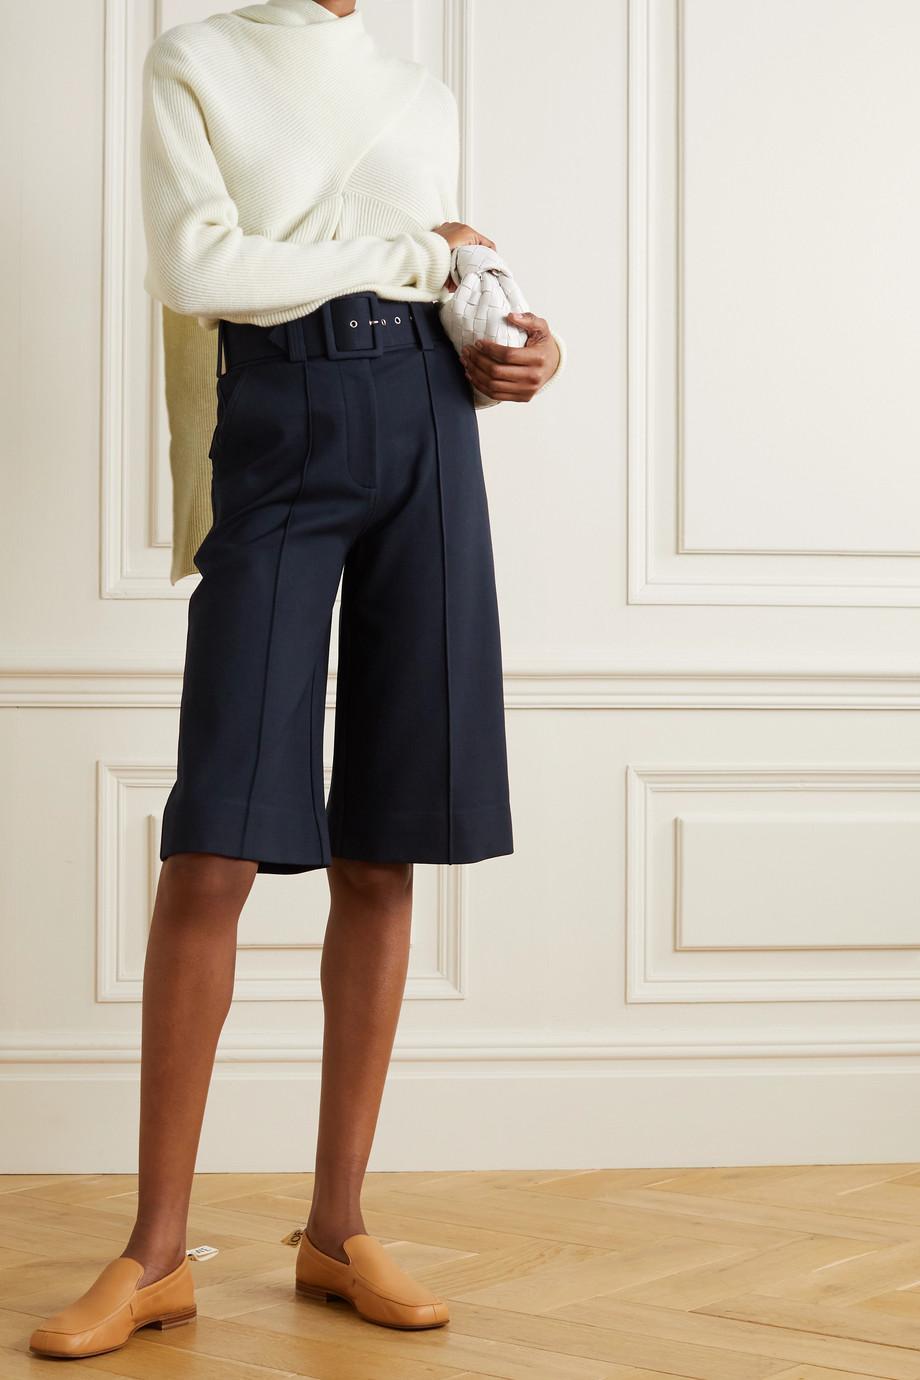 Victoria, Victoria Beckham 配腰带双罗纹裙裤